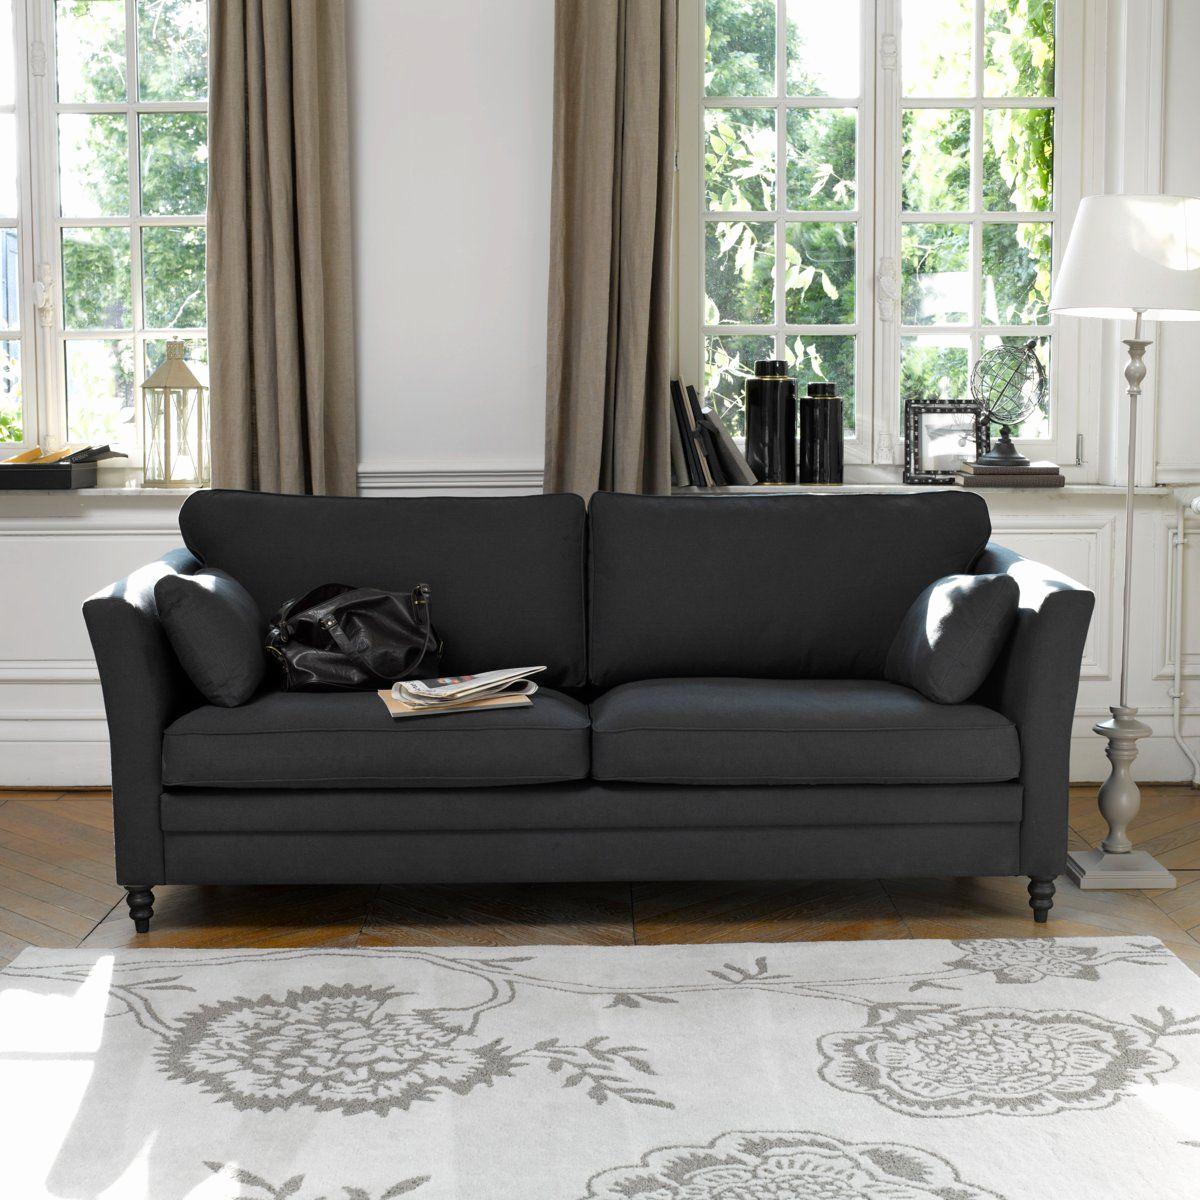 canape lin la redoute impressionnant stock canap. Black Bedroom Furniture Sets. Home Design Ideas